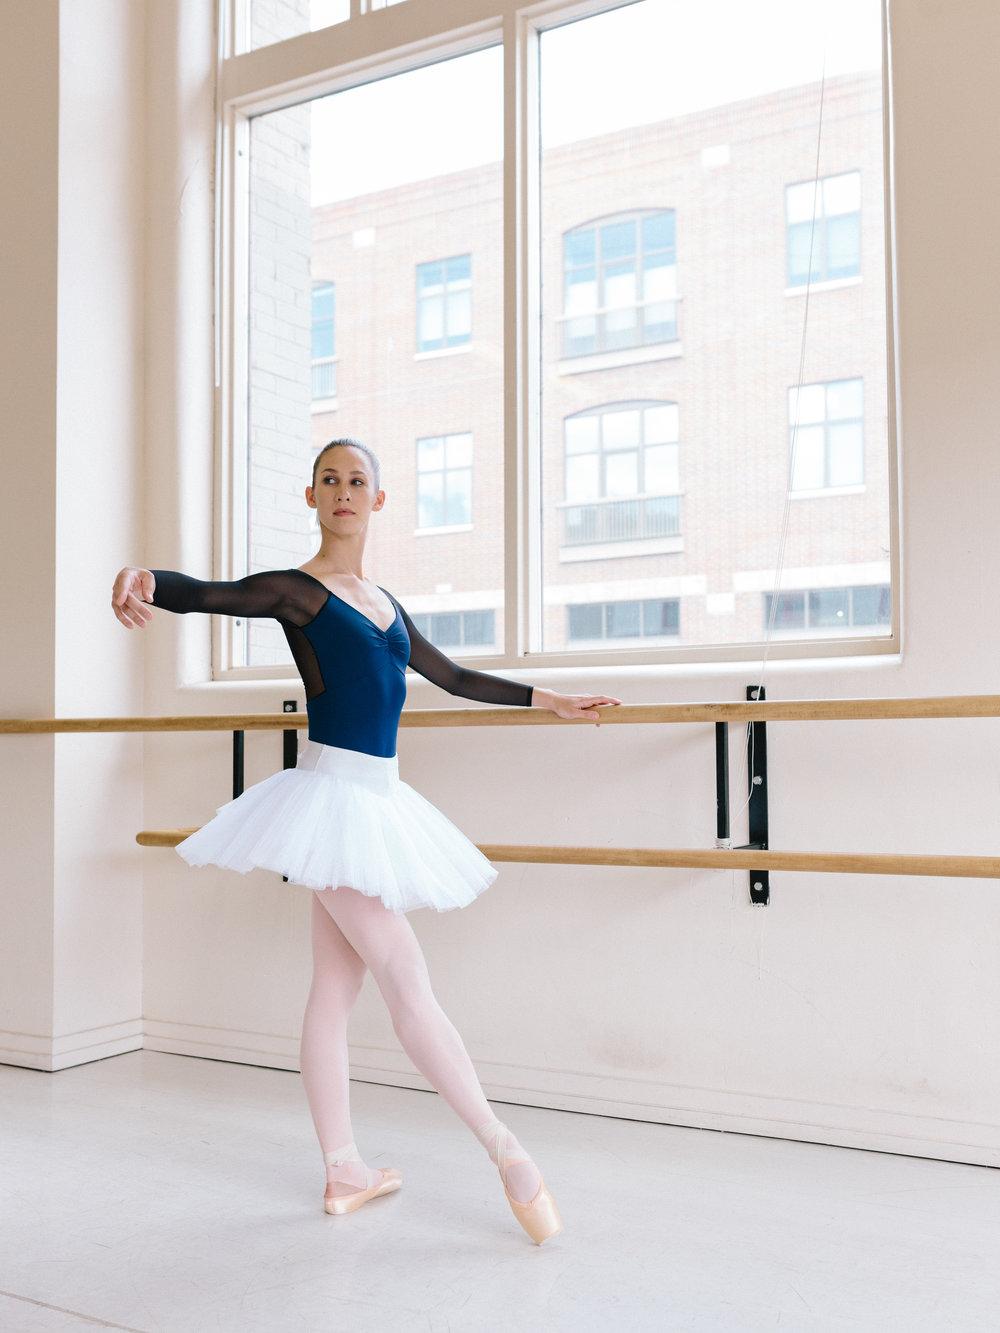 Jessica_Ballet-1.JPG